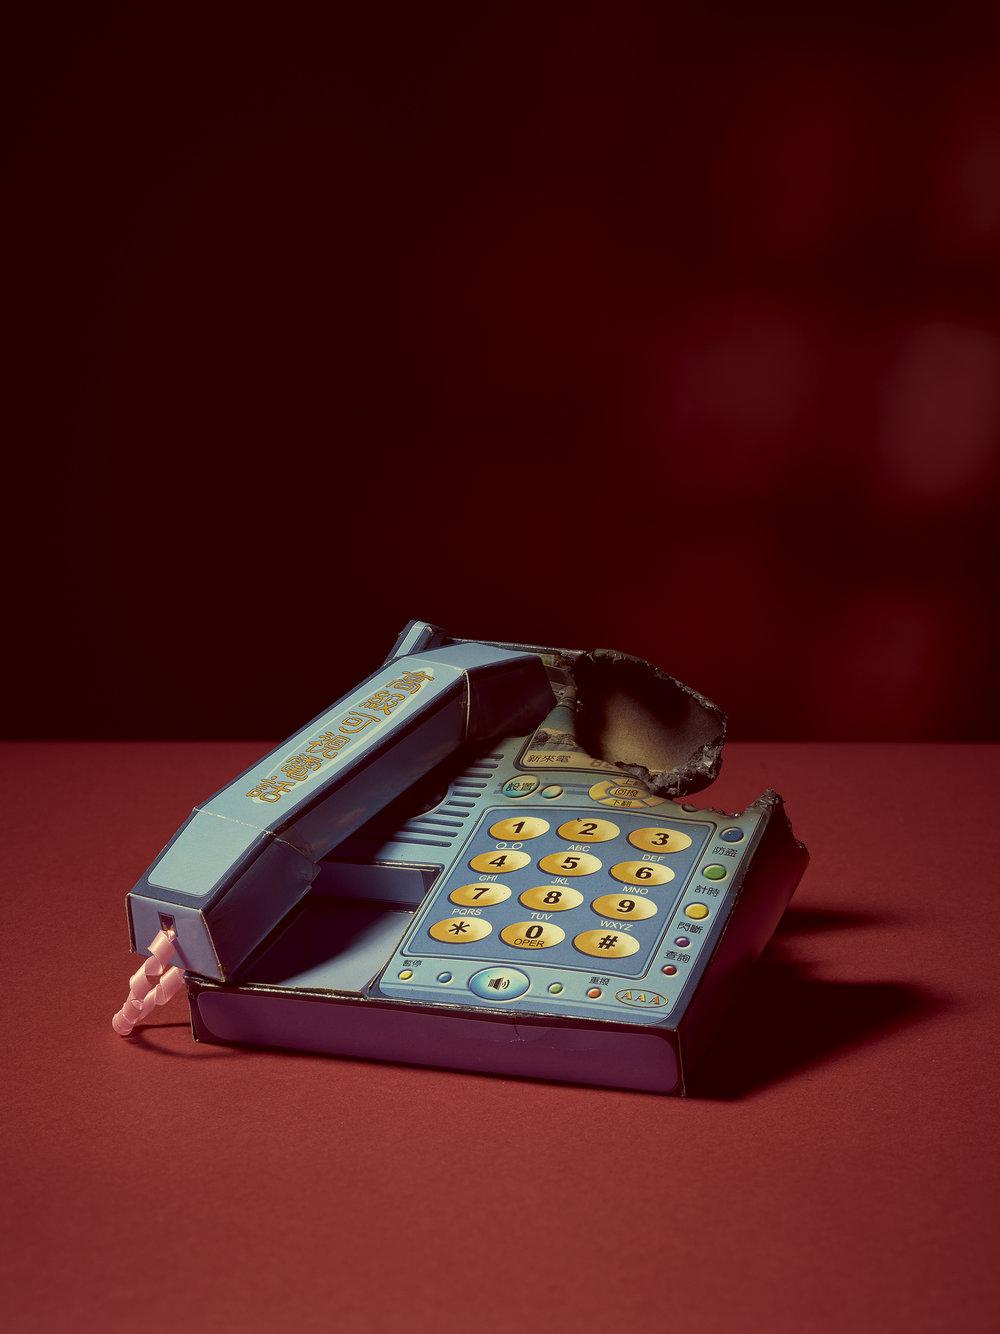 PHONE_399-393.jpg